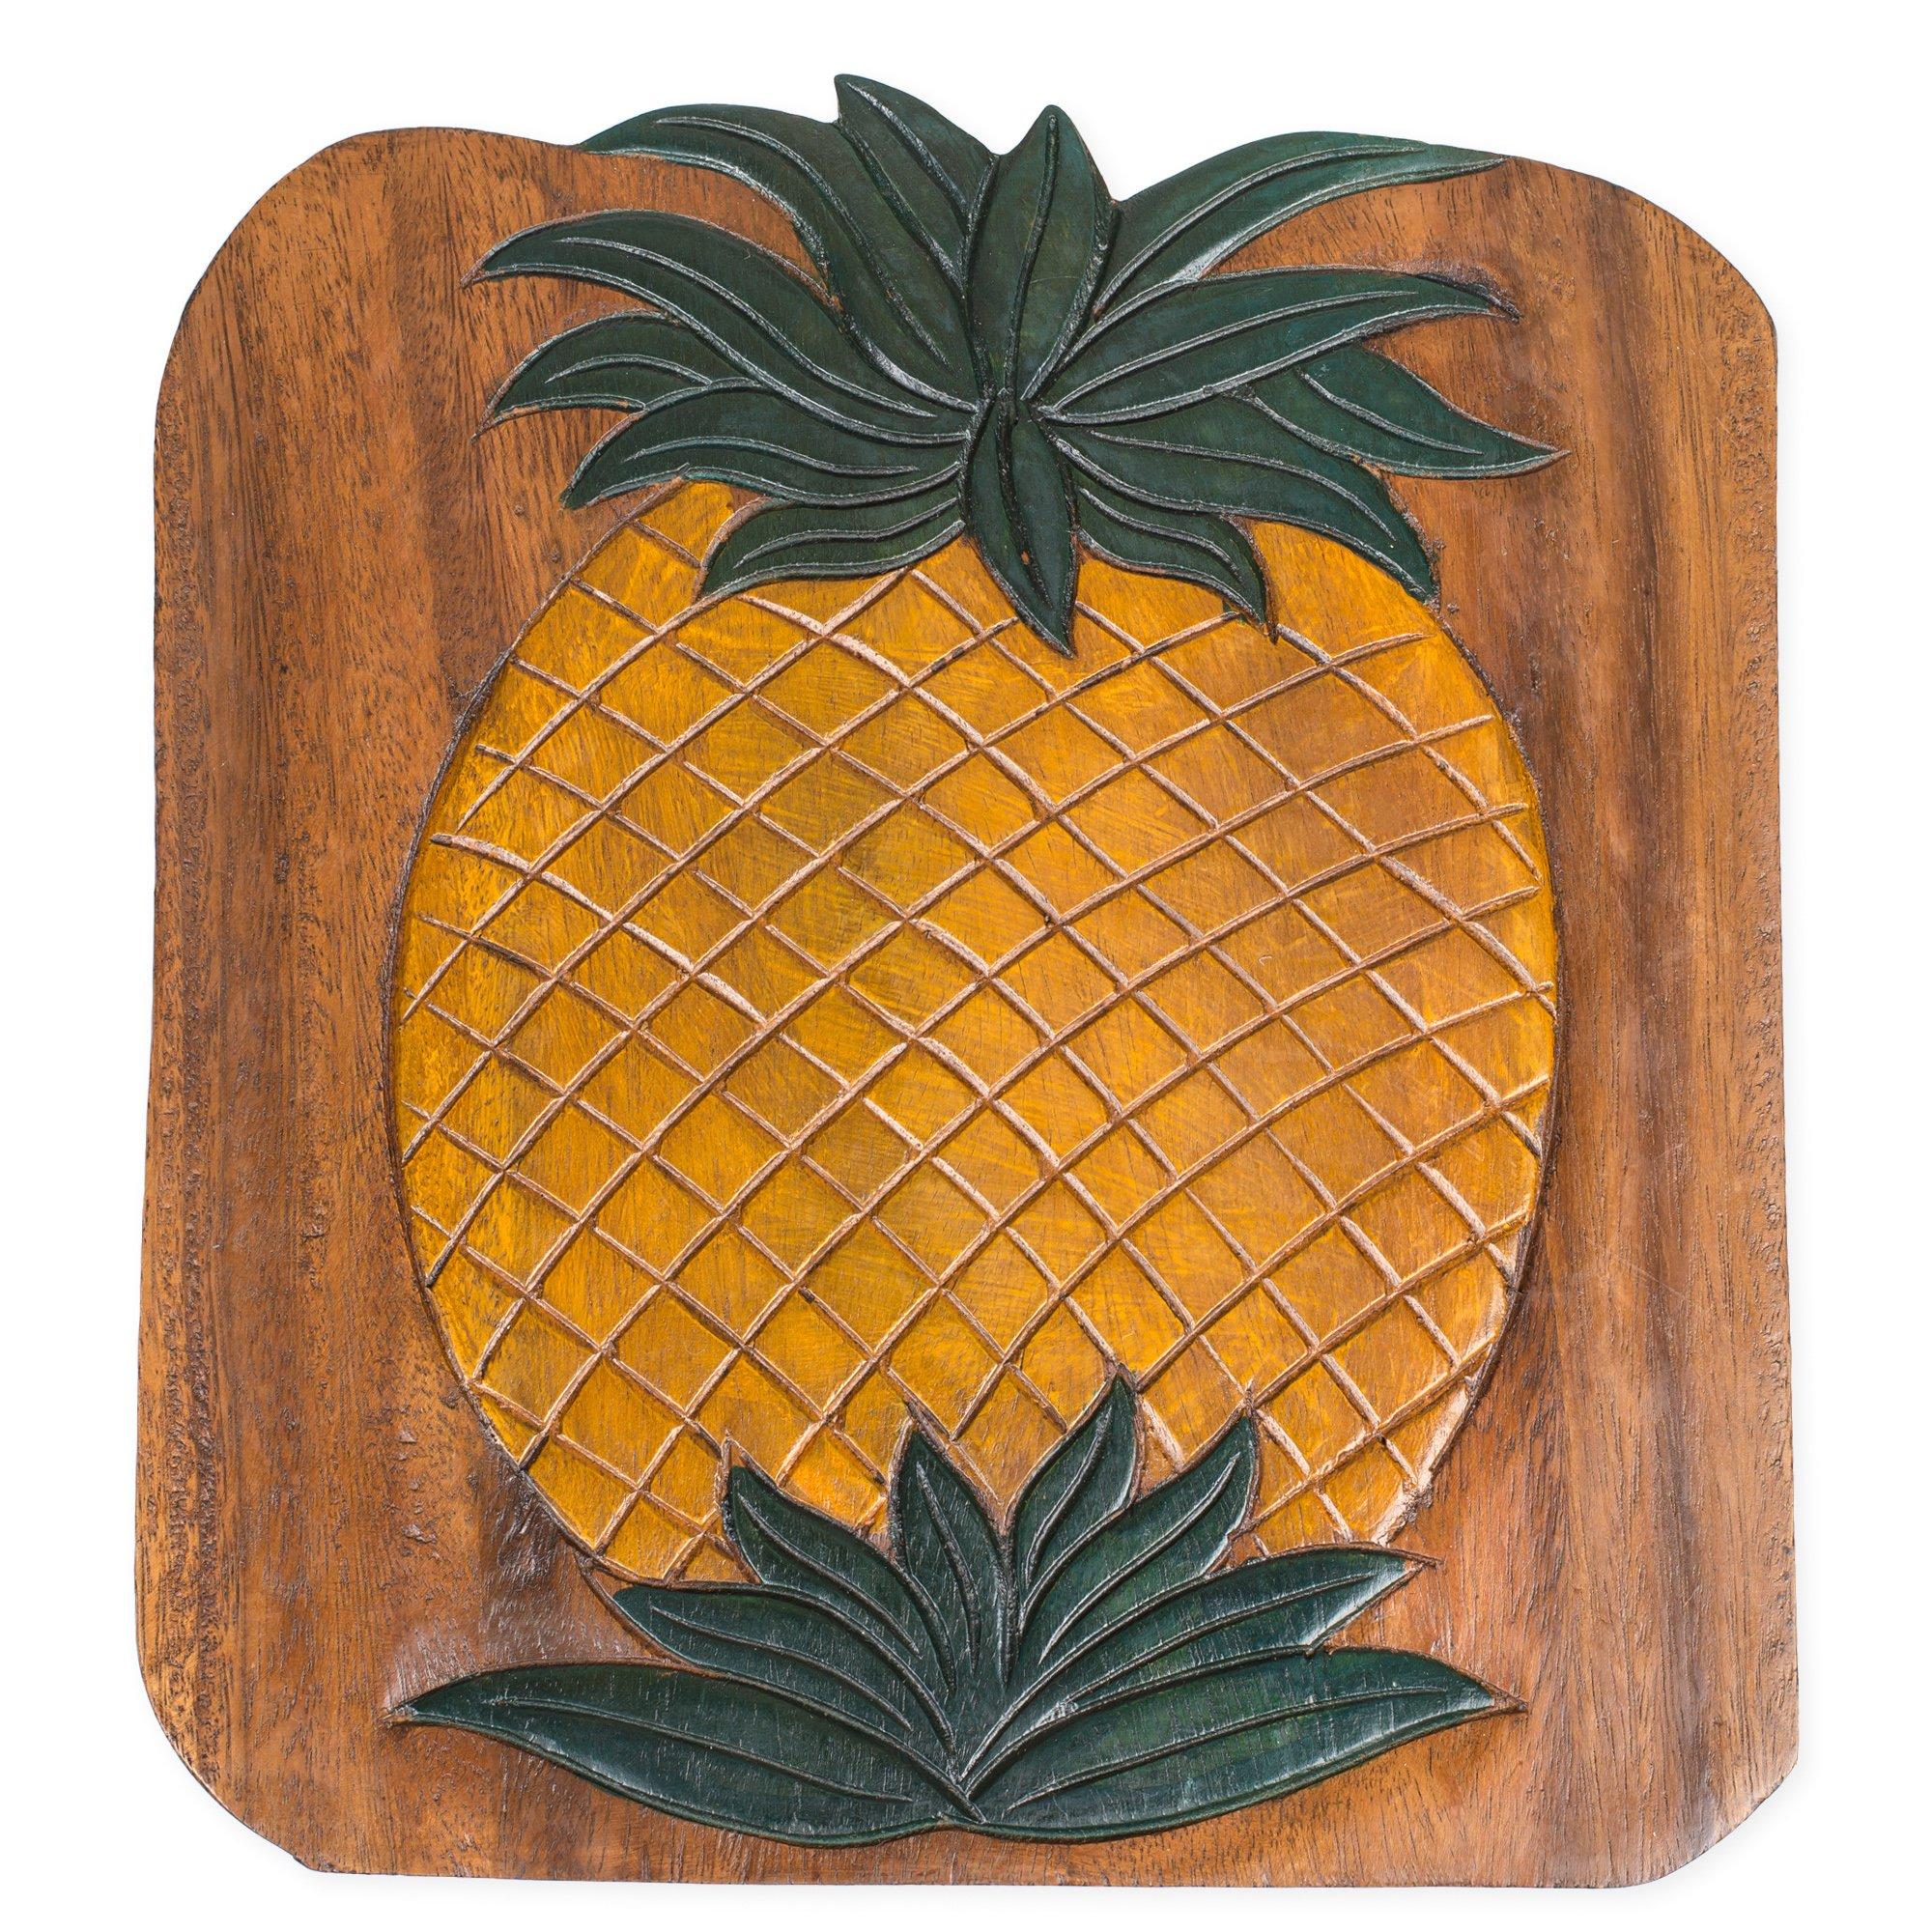 Pineapple Design Hand Carved Acacia Hardwood Decorative Short Stool by Sea Island (Image #4)